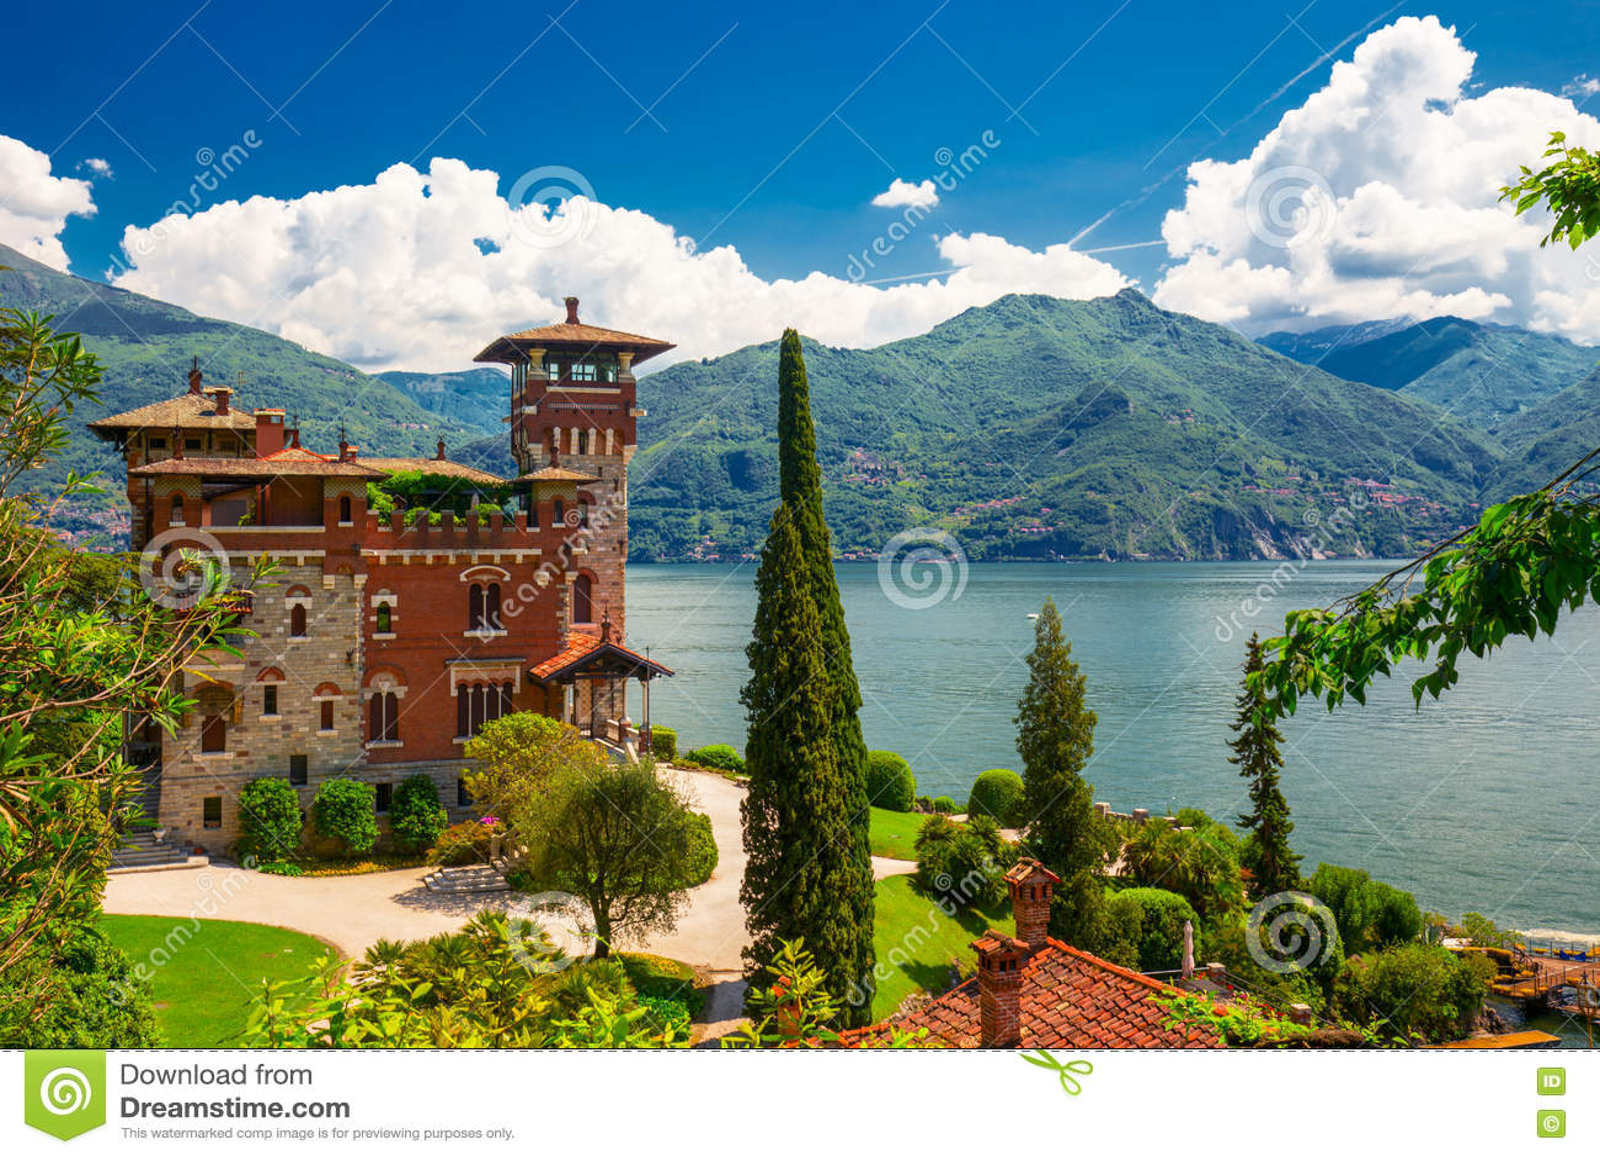 Lake Como, Italy, Europe. Villa was used for film scene in movie